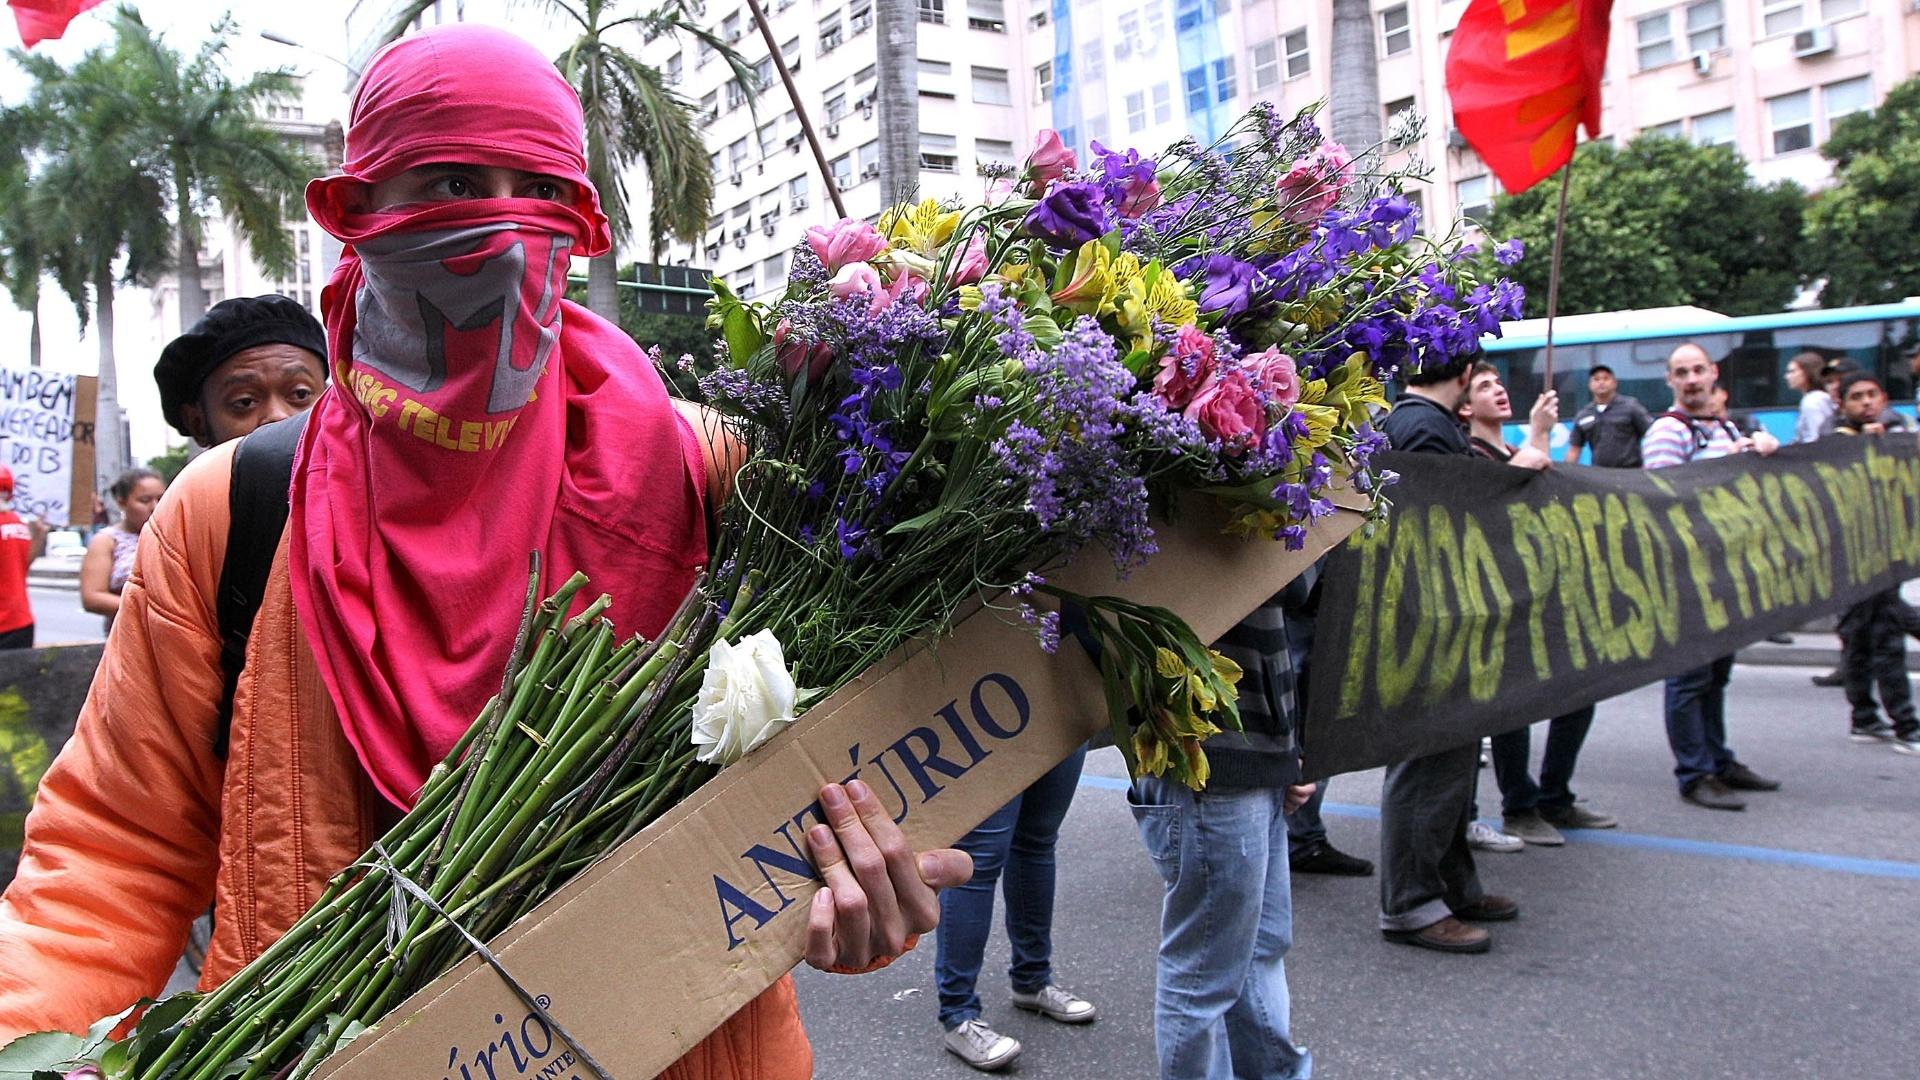 31.out.2013 - Manifestantes participam do ato